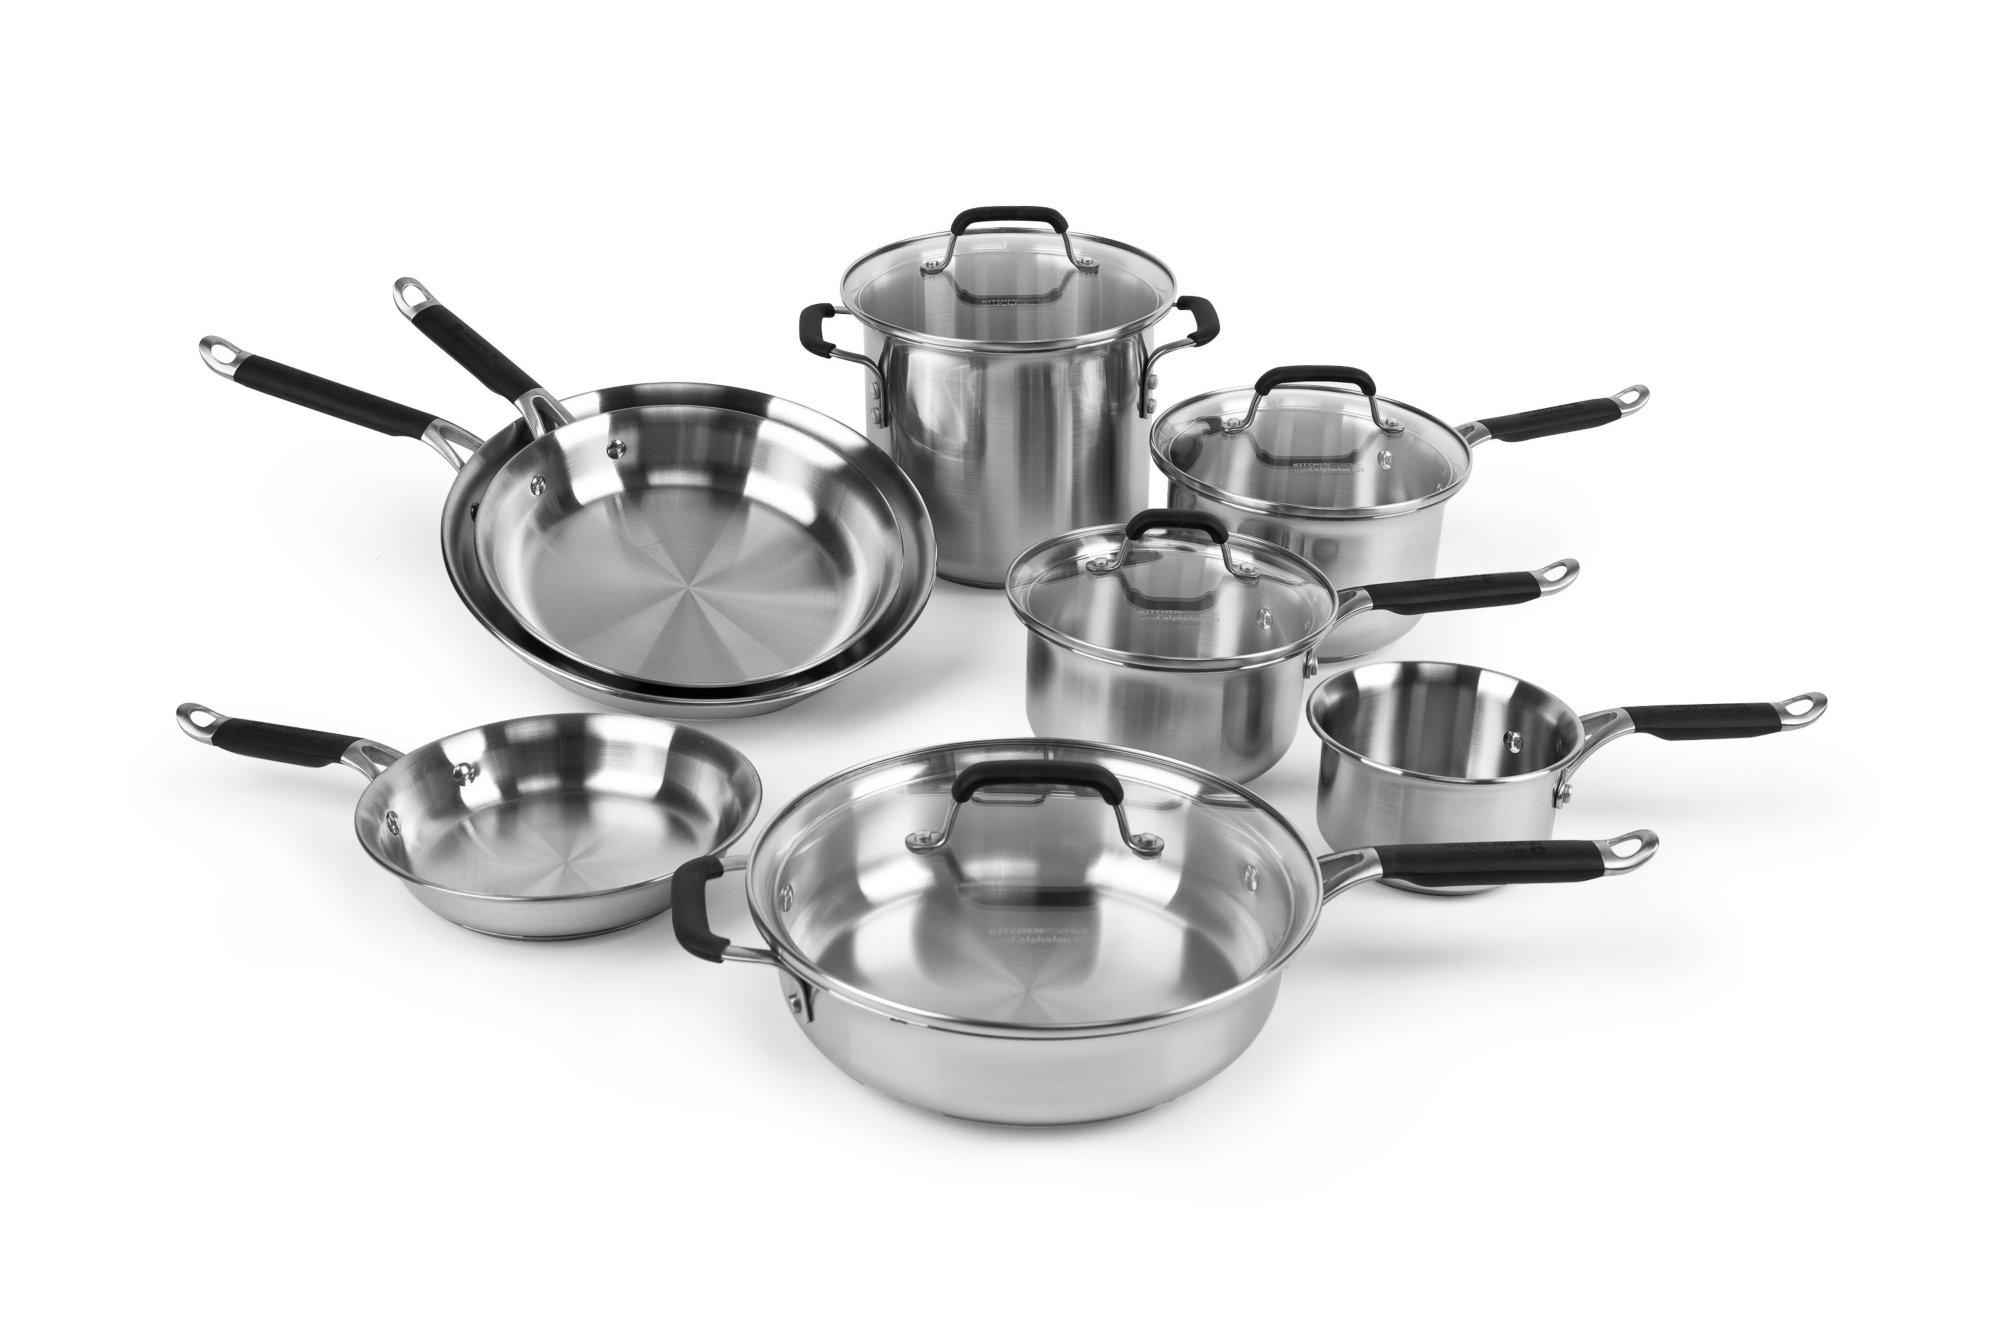 Calphalon Kitchen Essentials Stainless Steel 12-pc. Cookware Set ...